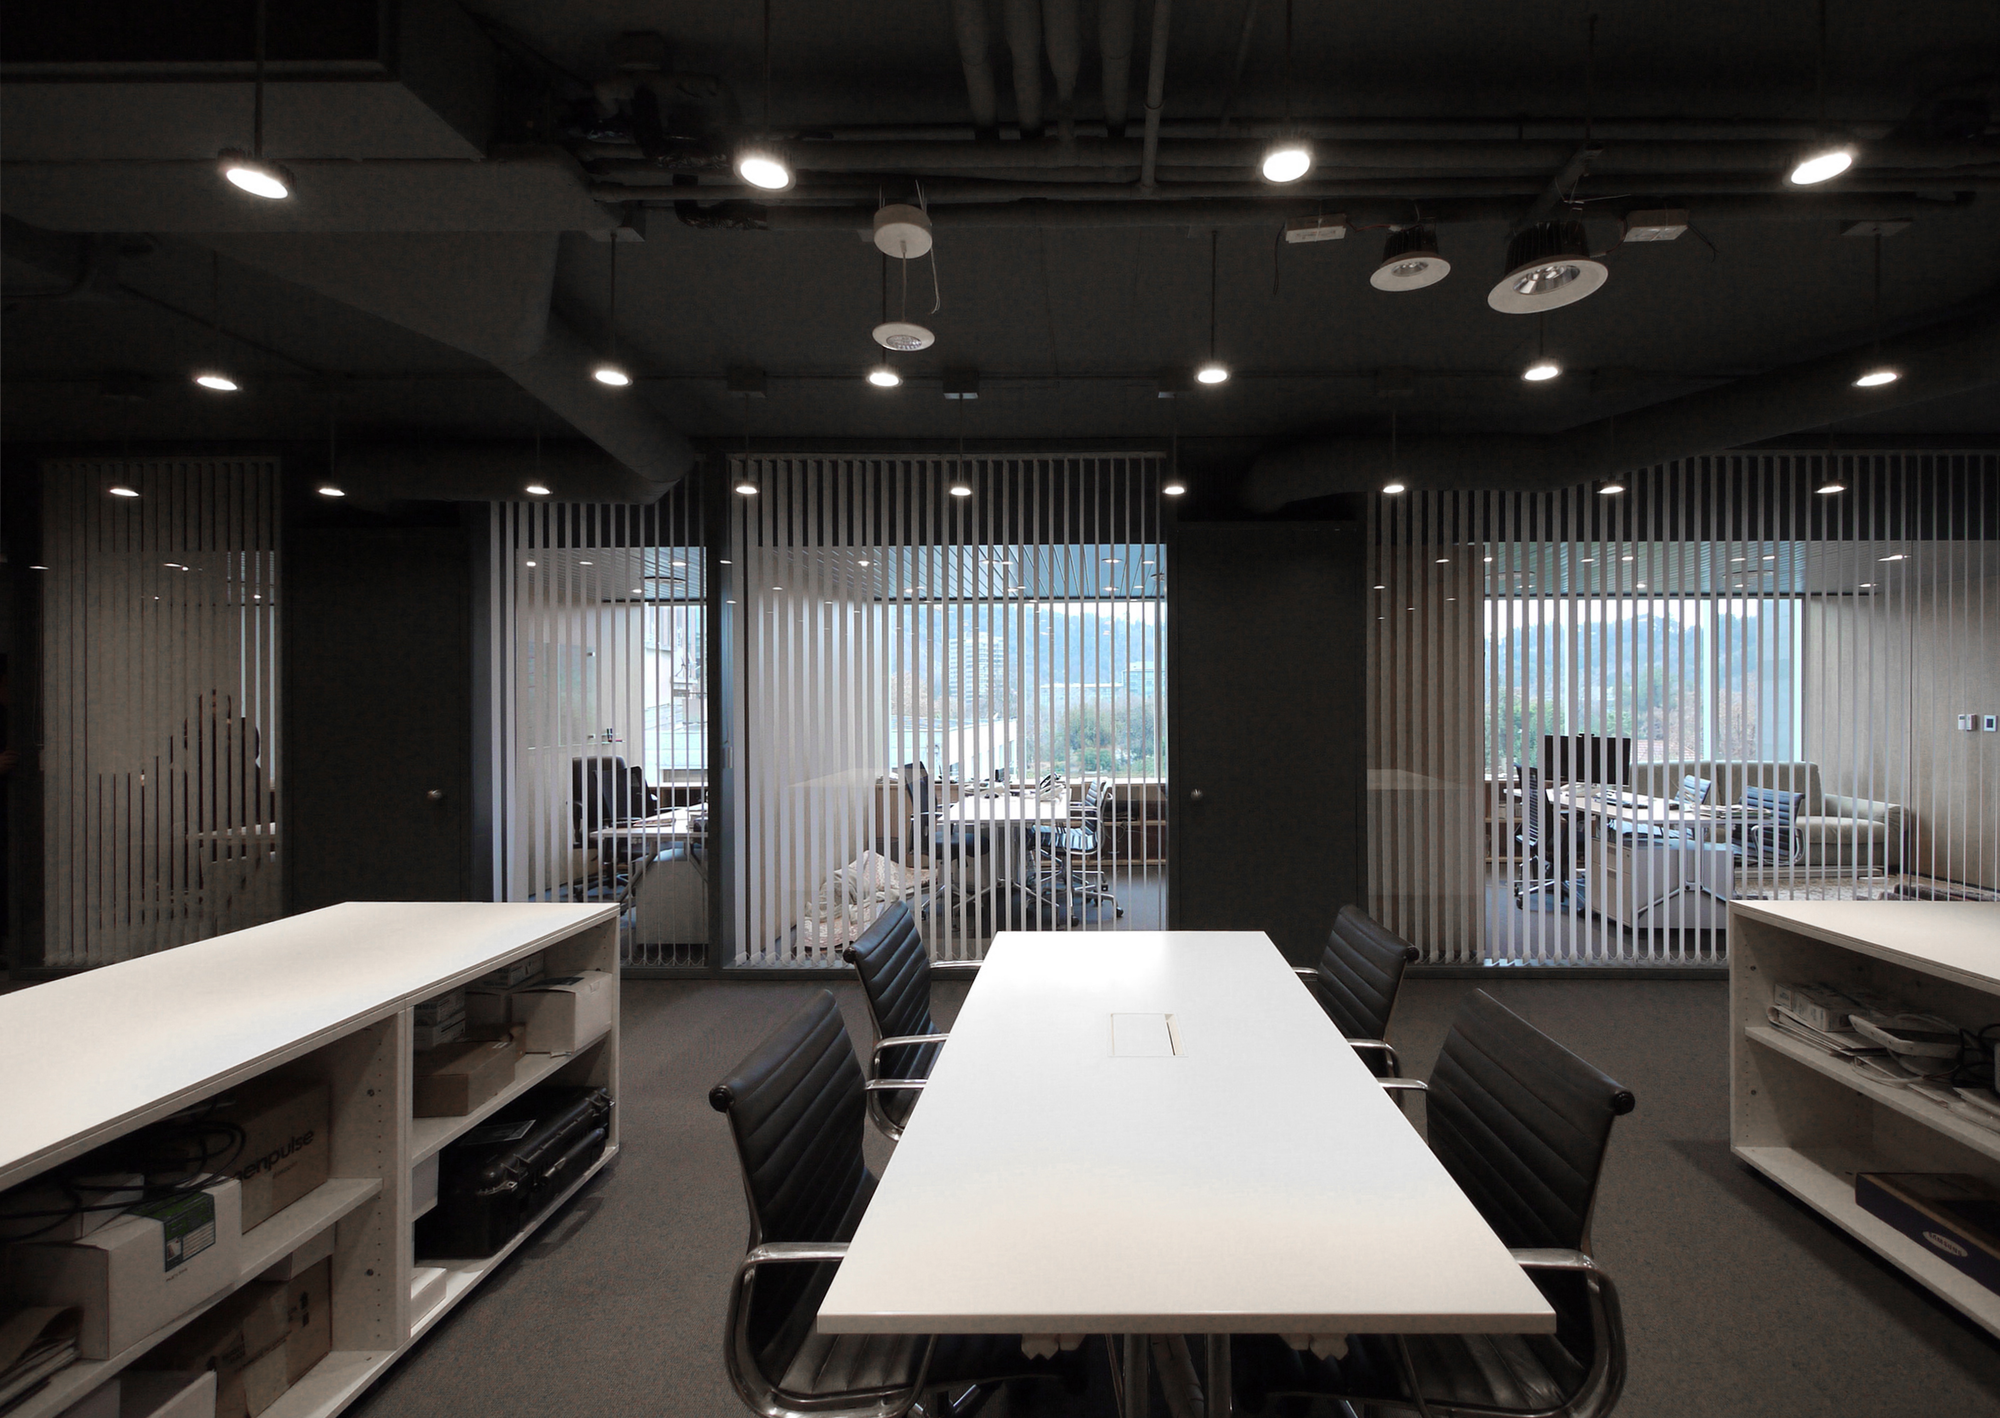 Led-LS / Amunátegui Valdés Architects